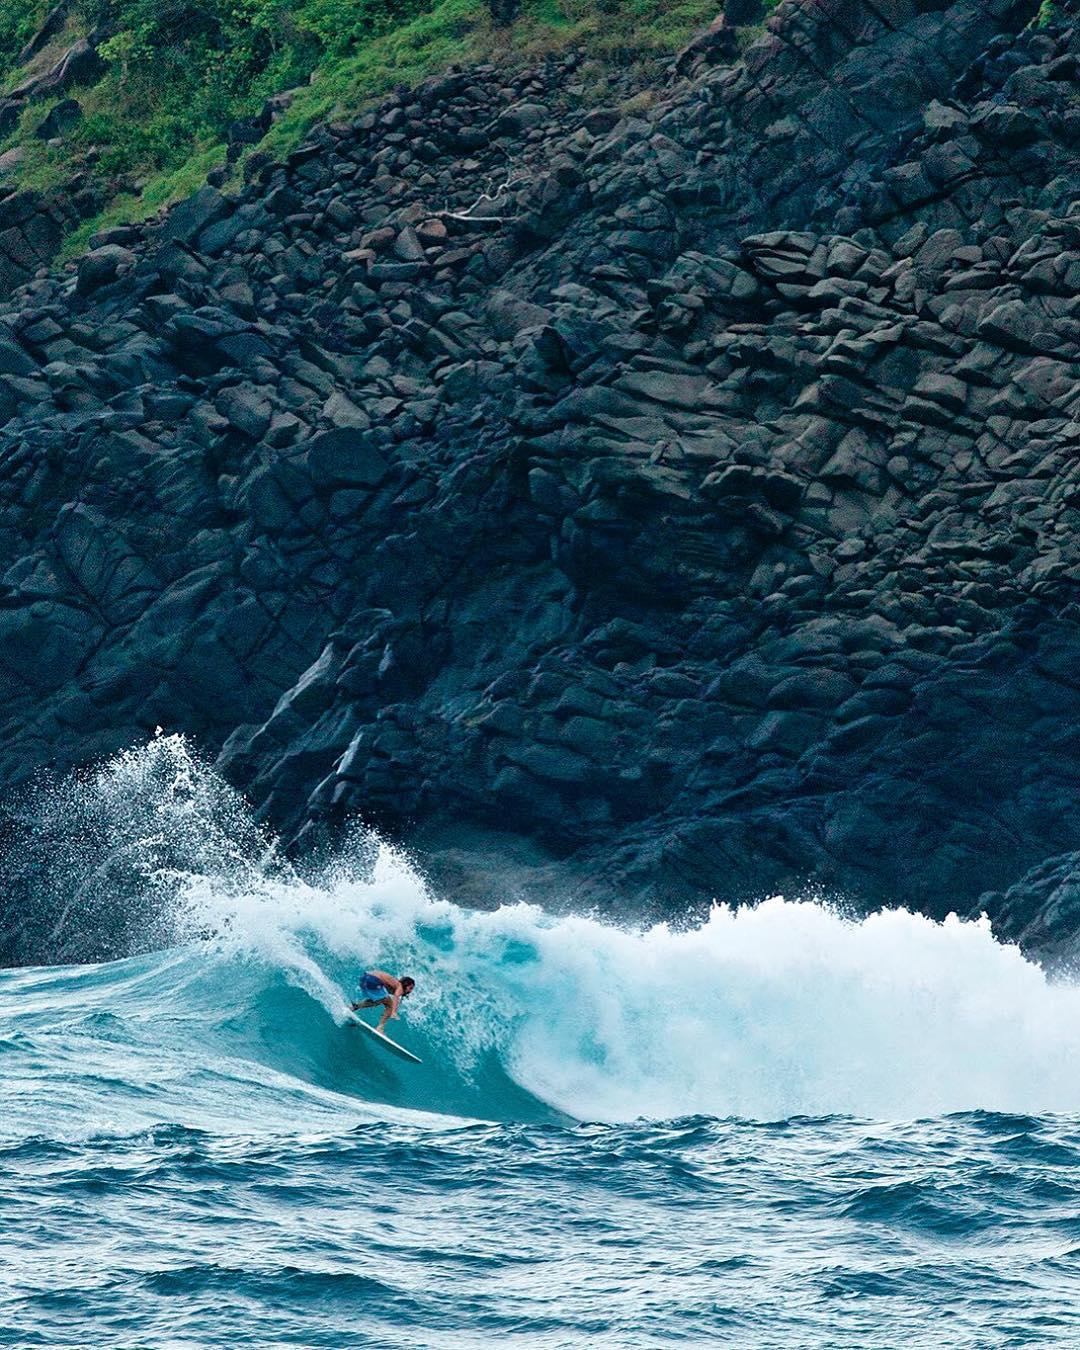 Water Sports in Bali; Surfing